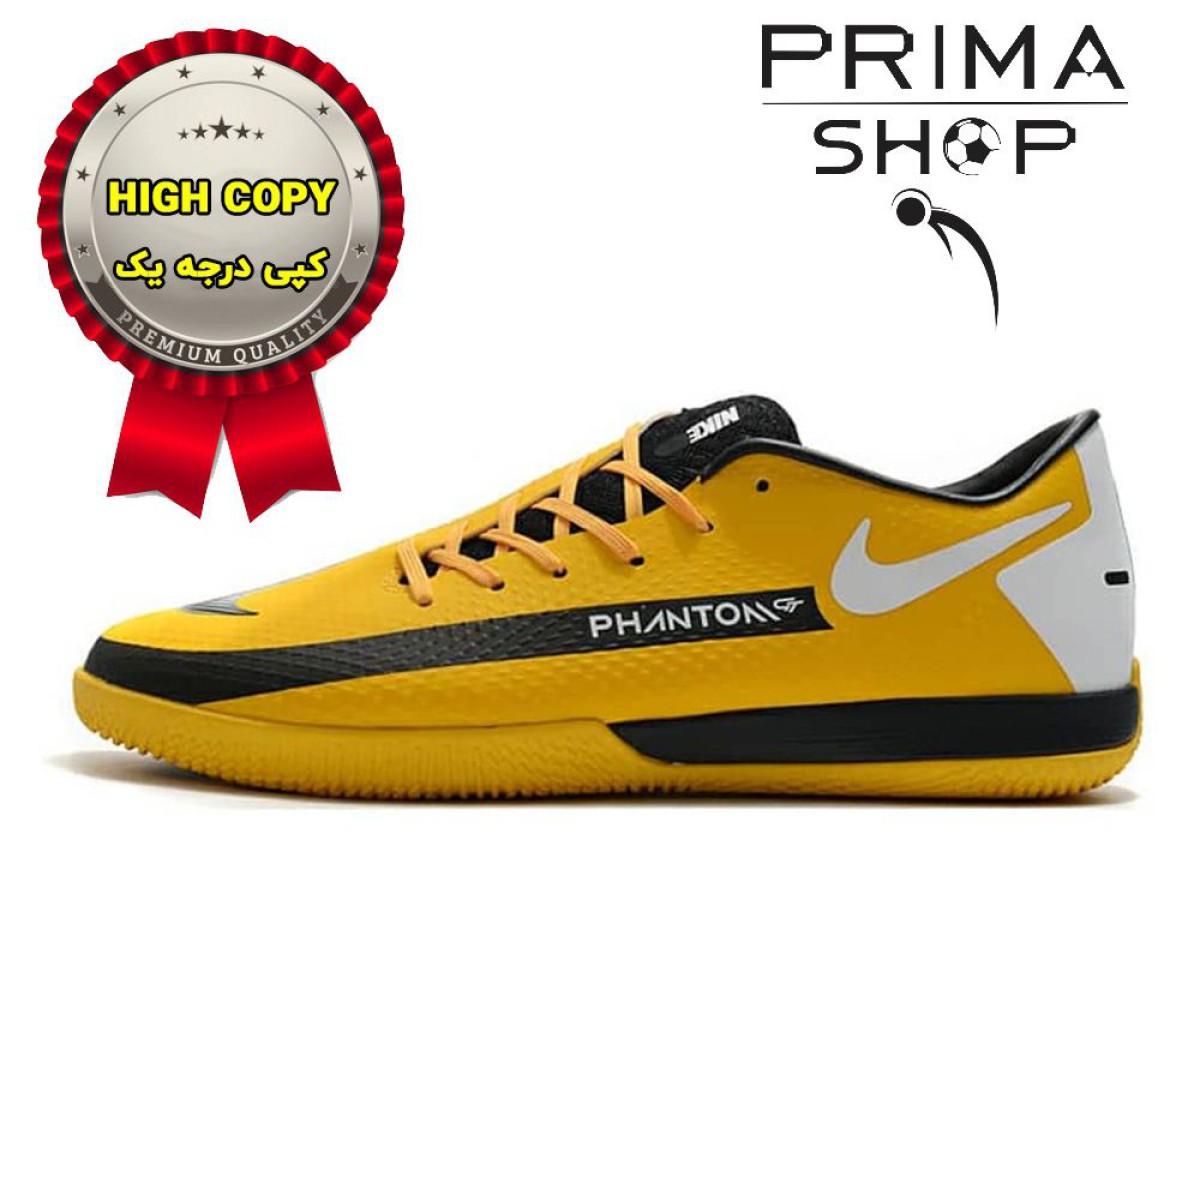 کفش فوتسال نایک فانتوم جی تی آکادمی زرد (های کپی)